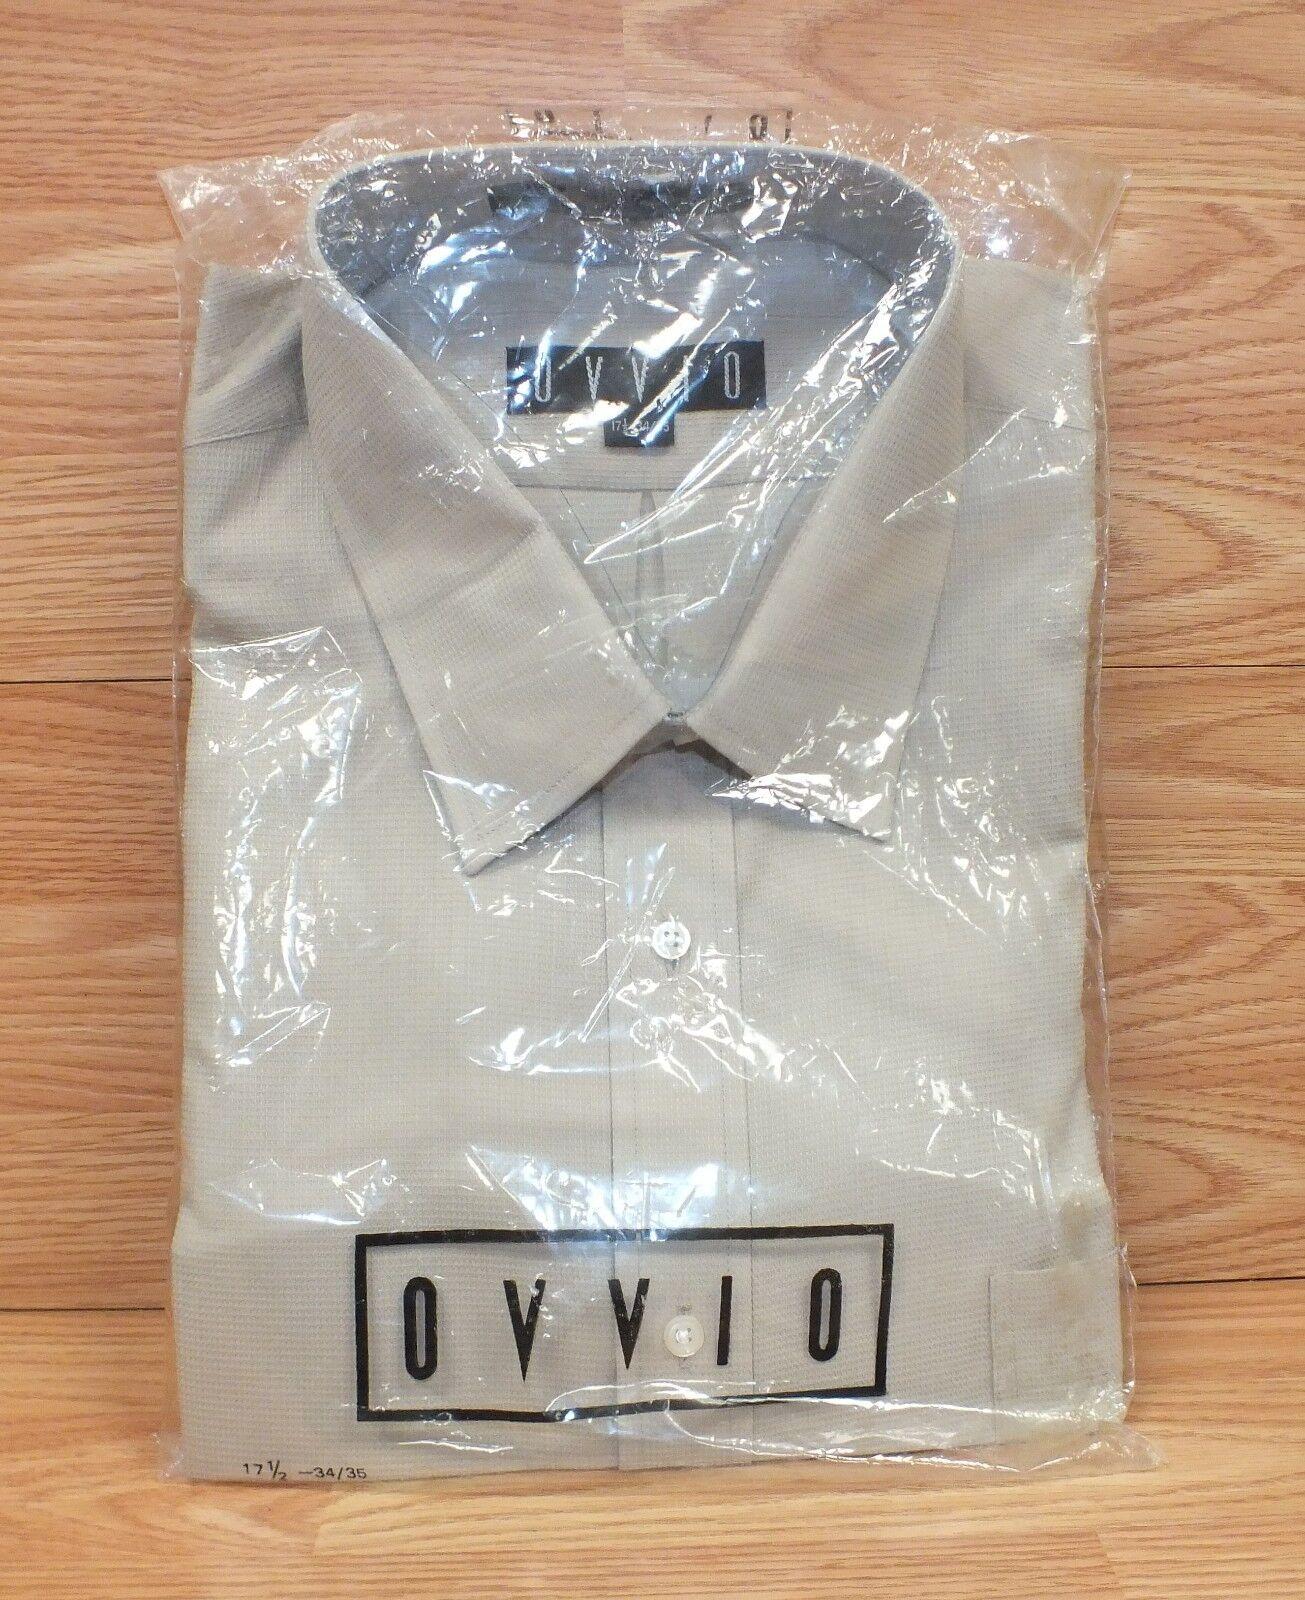 Ovvio Beige 17 1 2 - 34 35 Men's Casual Long Sleeve 100% Fine Cotton Shirt NEW